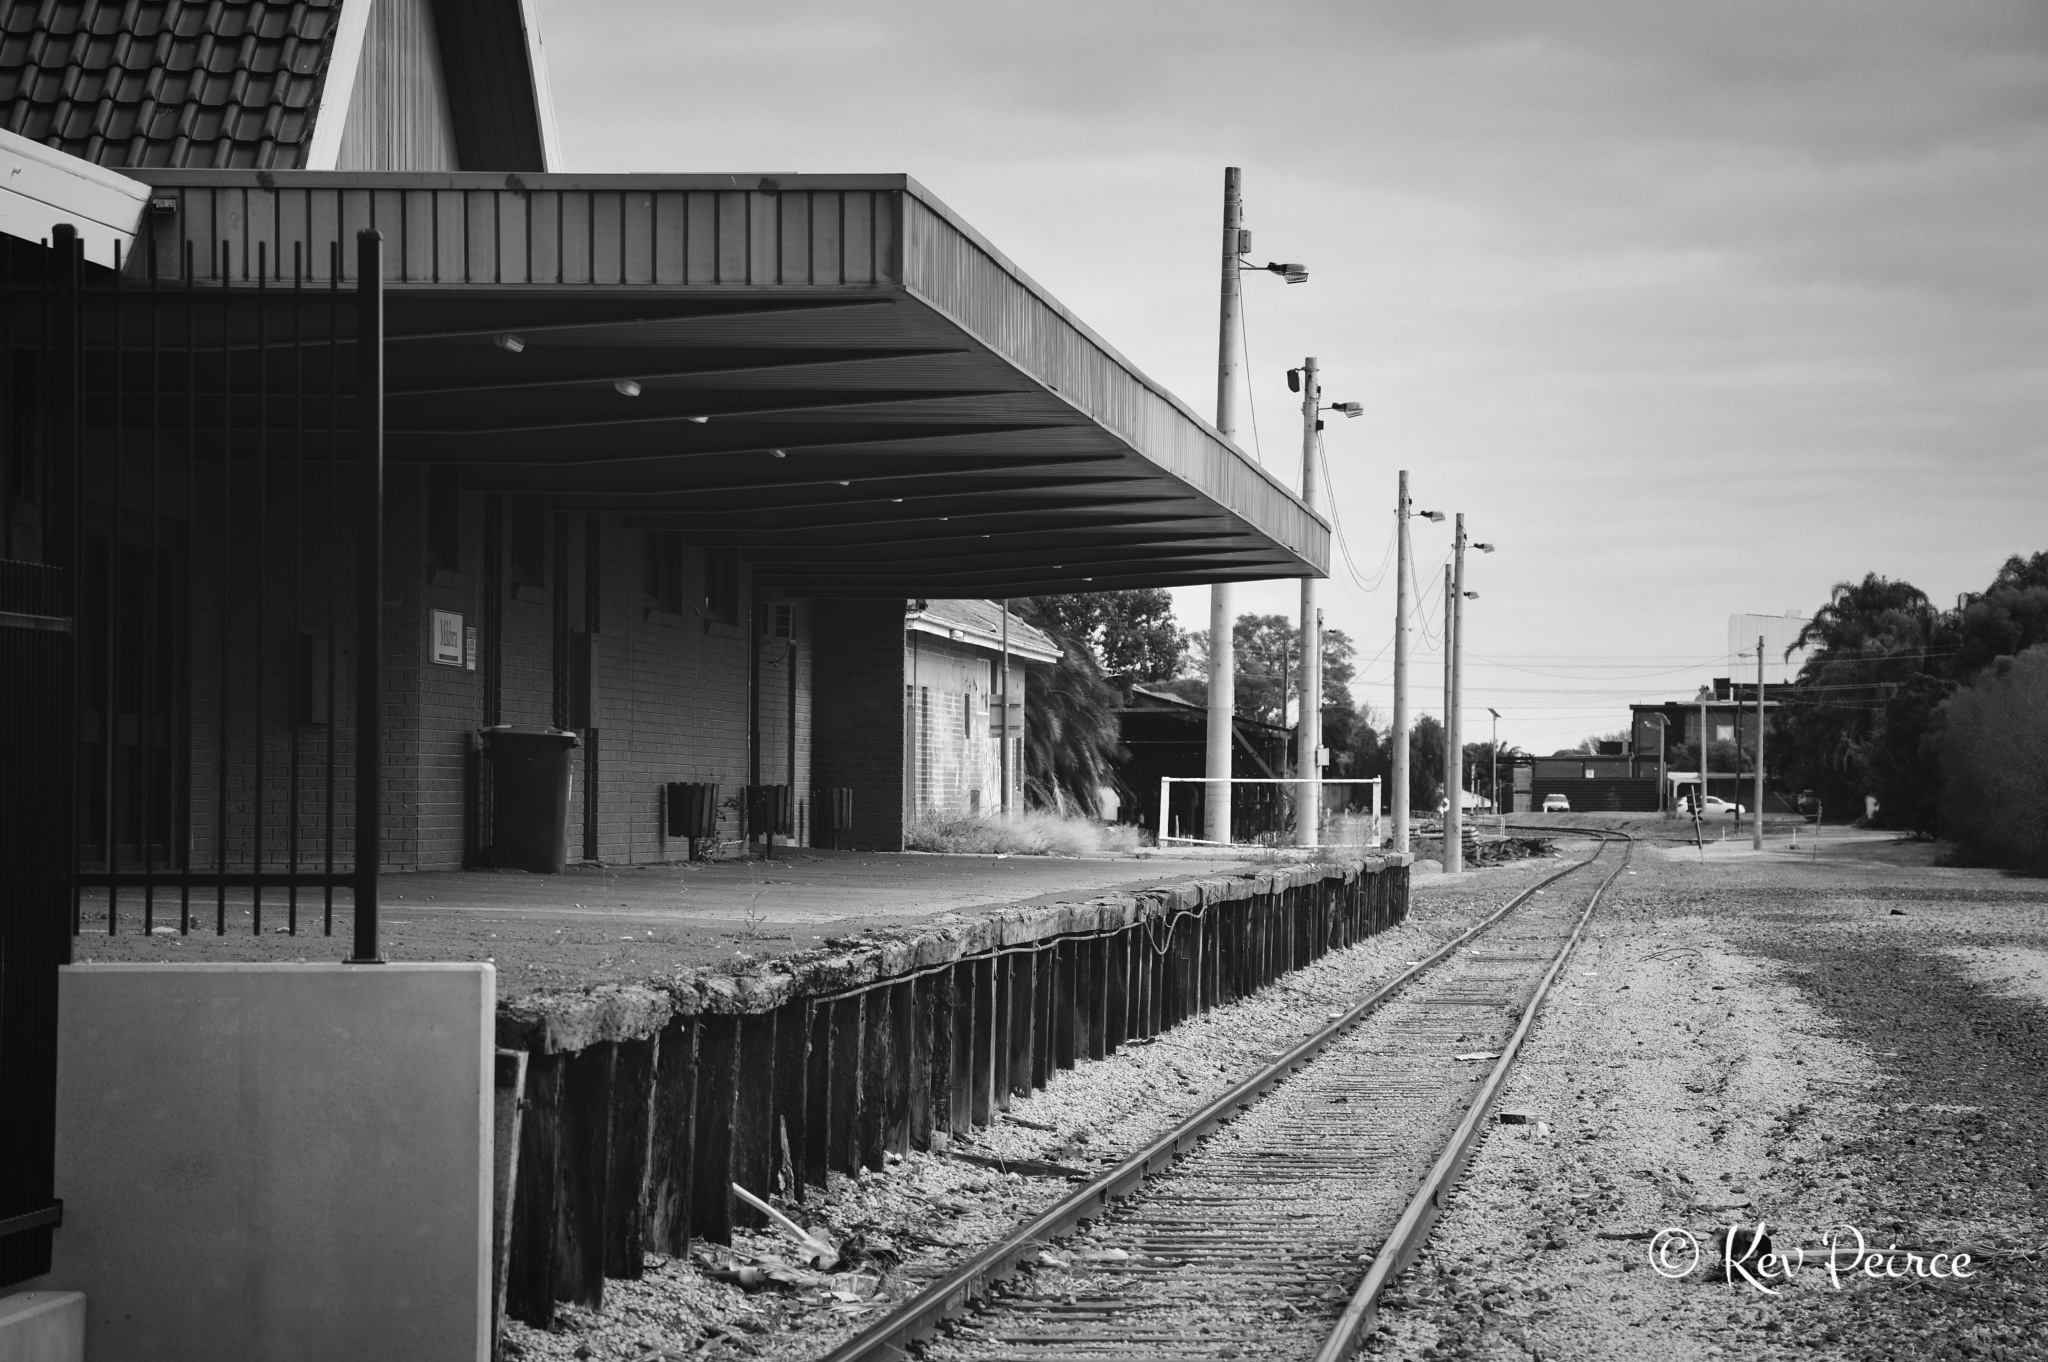 Mildura Rail Station by Kev Peirce